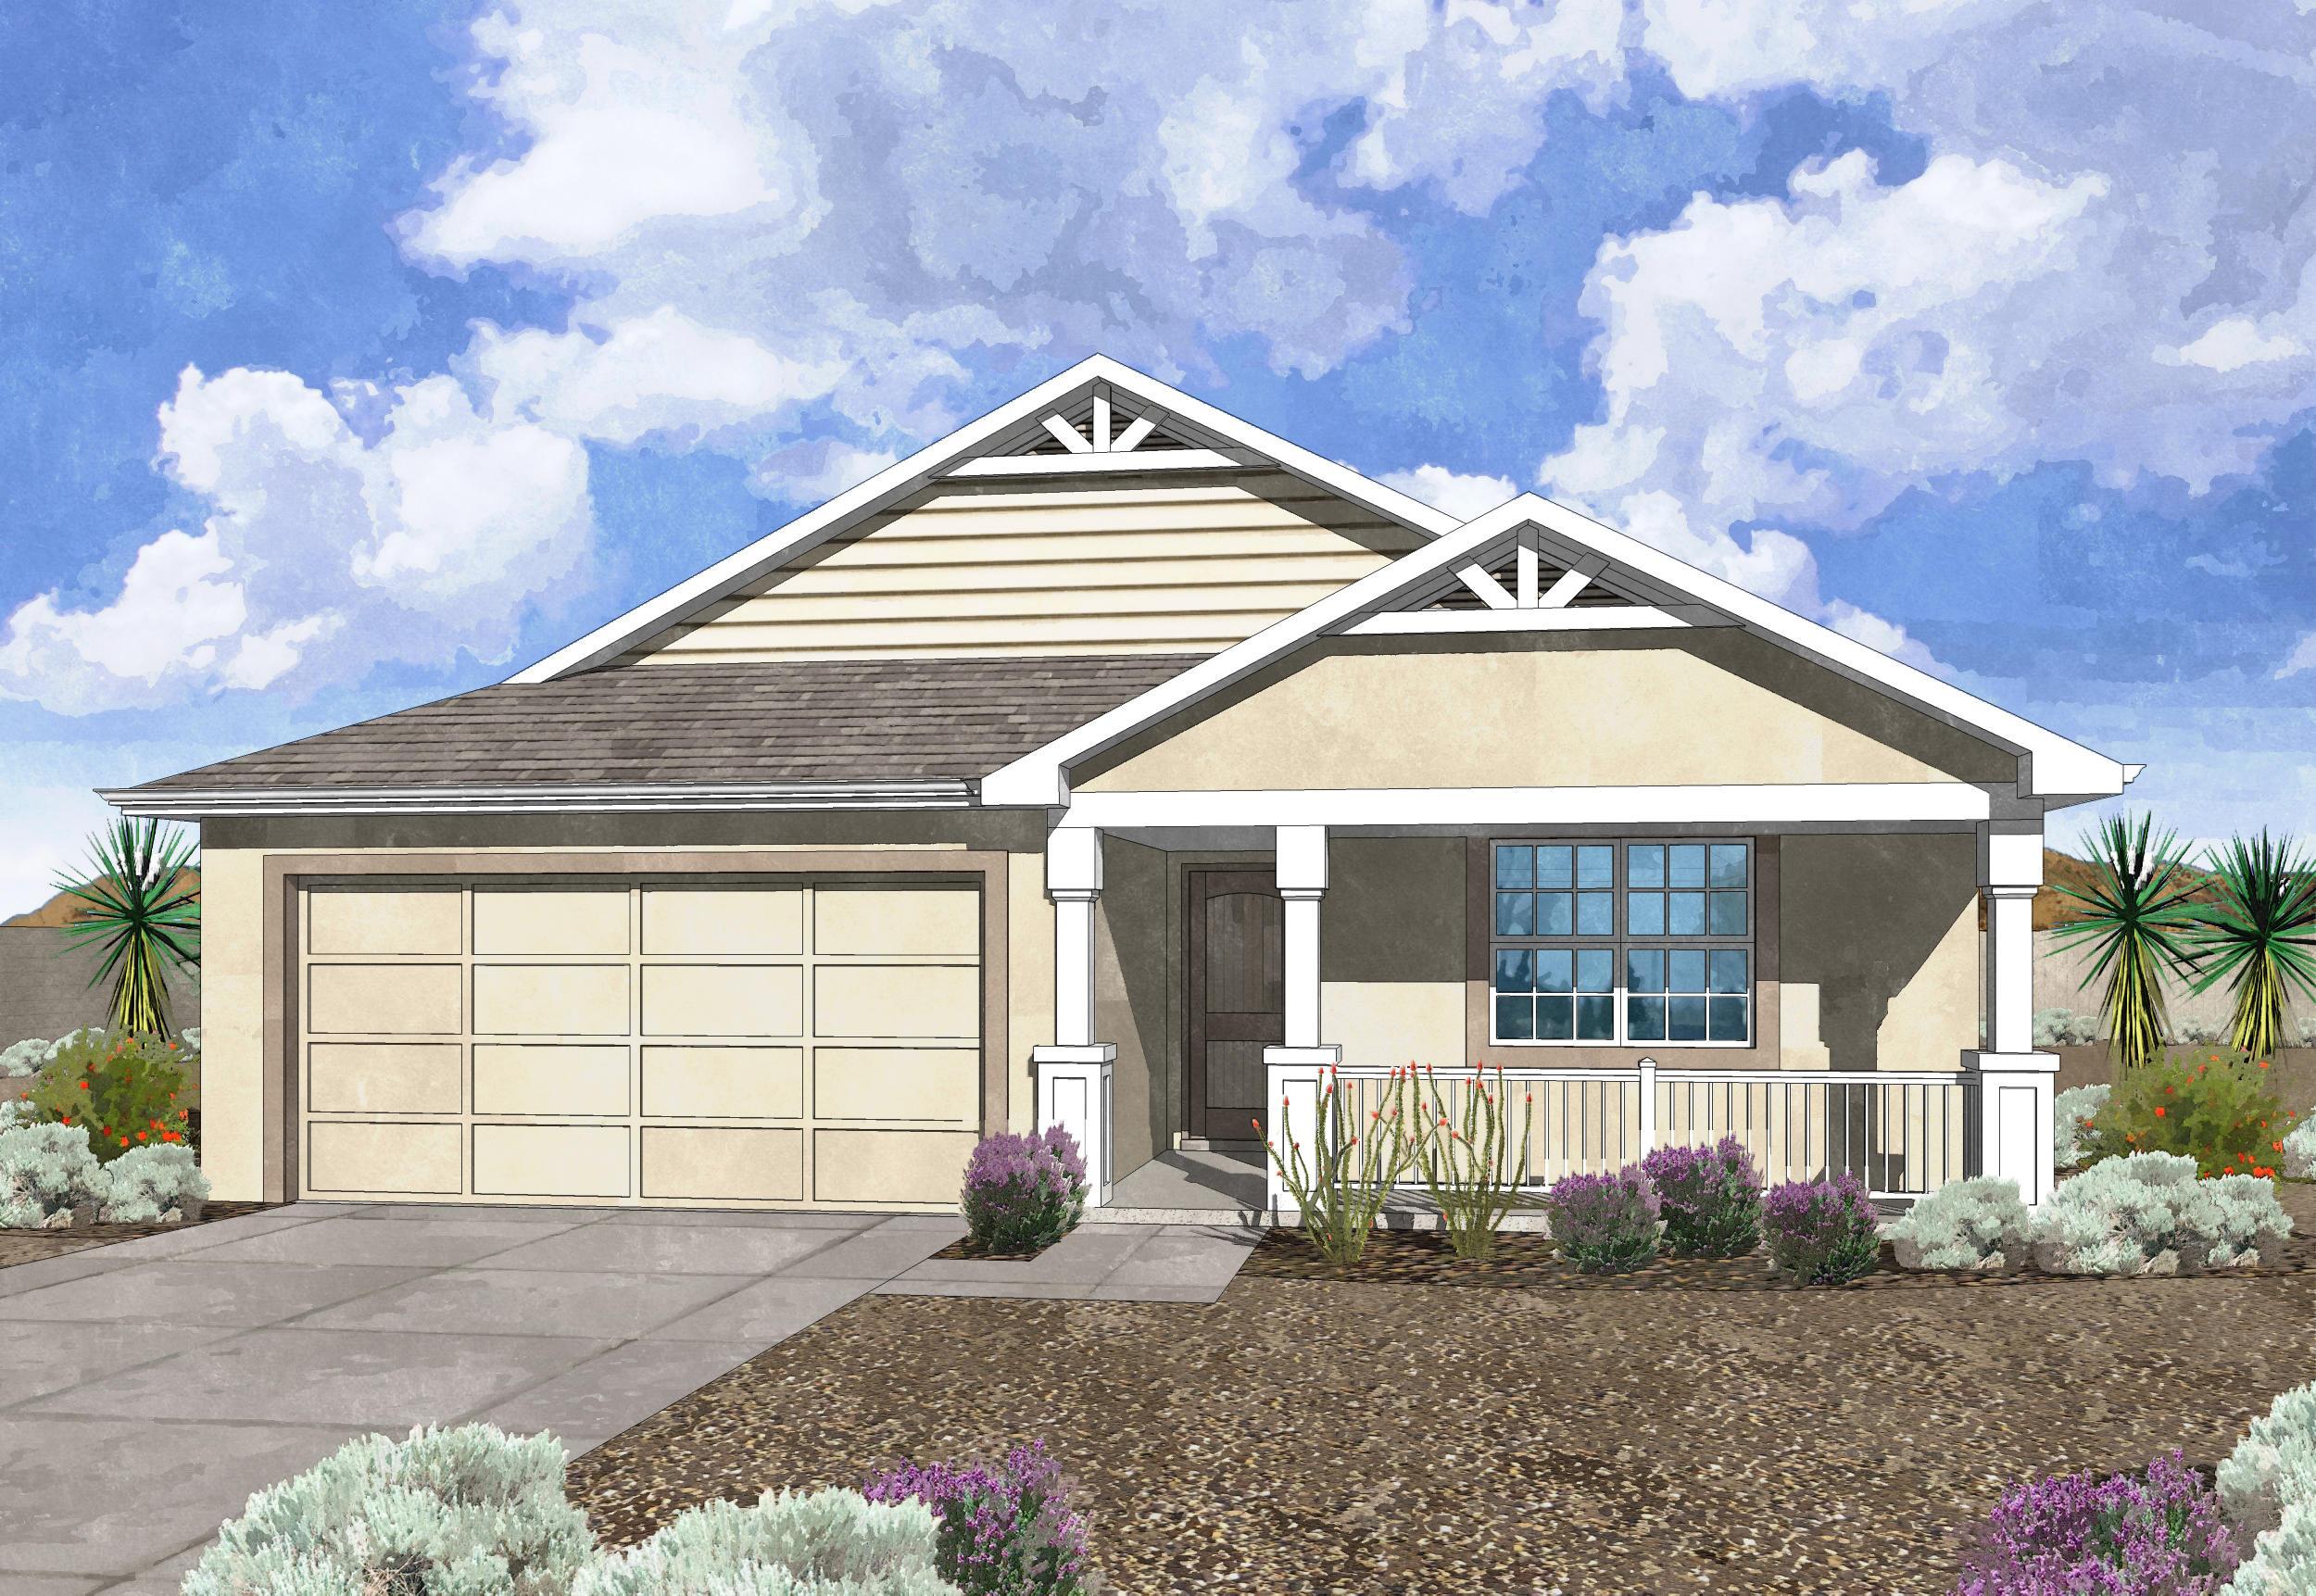 2323 Isabella Lane, Belen, NM 87002 - Belen, NM real estate listing